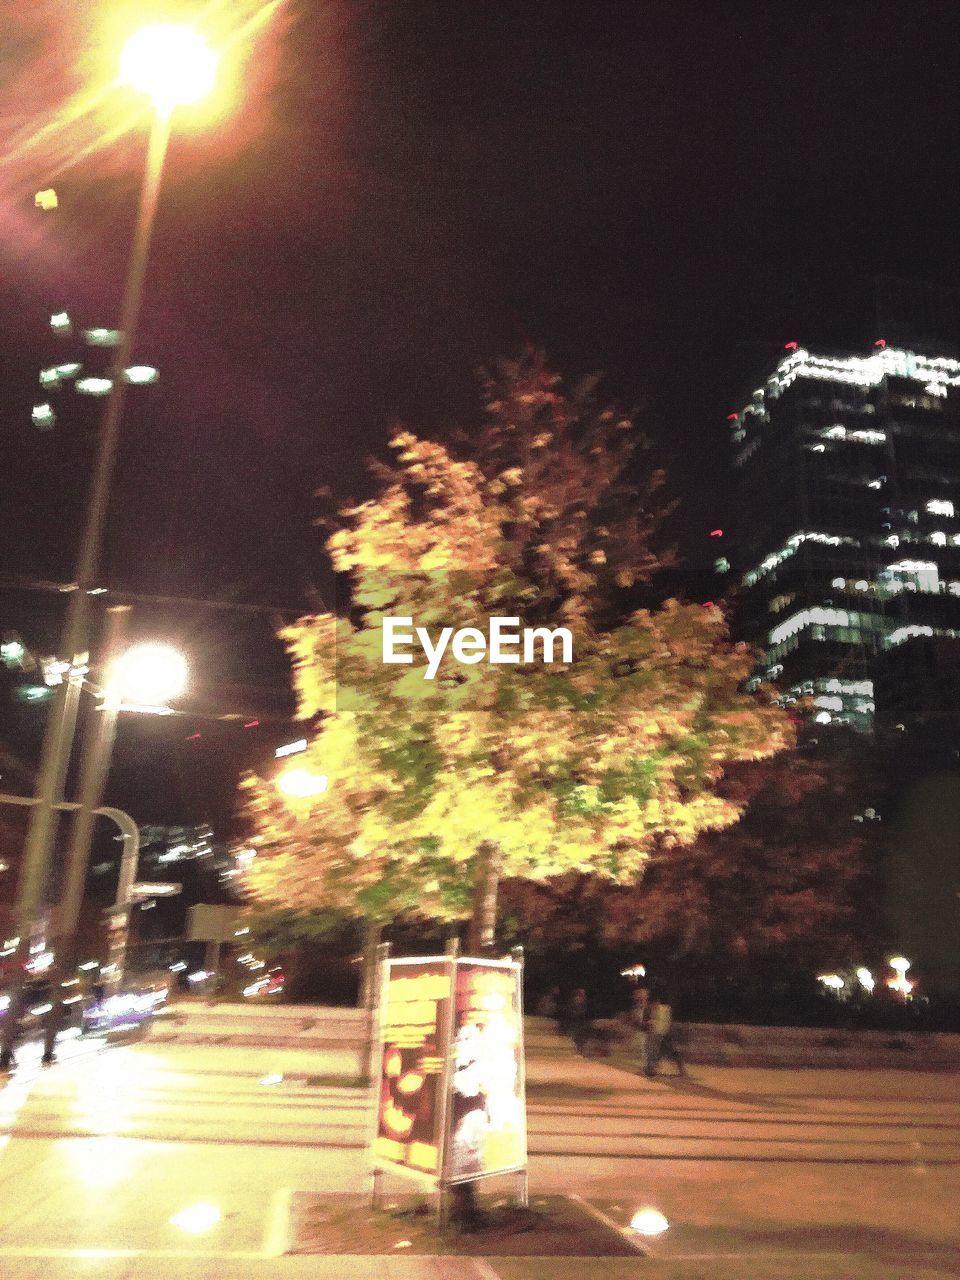 night, illuminated, street, road, transportation, city, tree, city life, car, outdoors, street light, building exterior, no people, architecture, sky